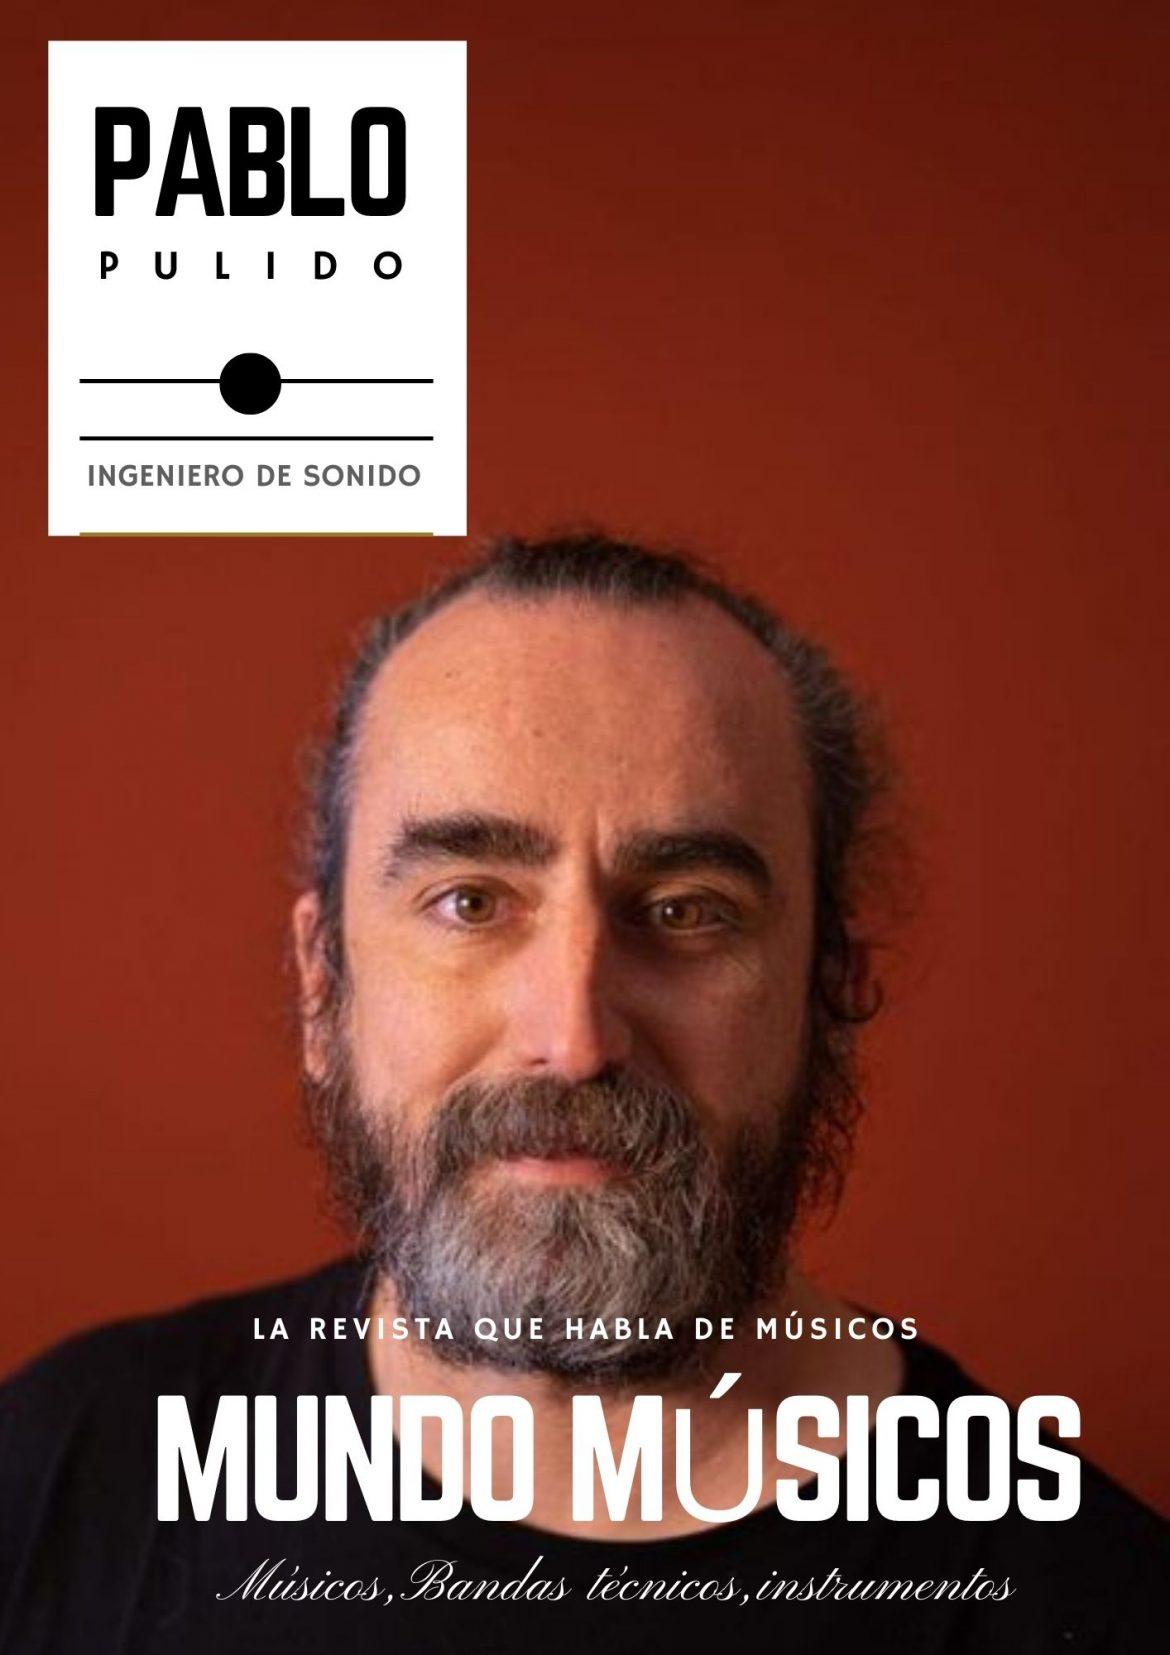 Pablo Pulido, Ingeniero de Sonido